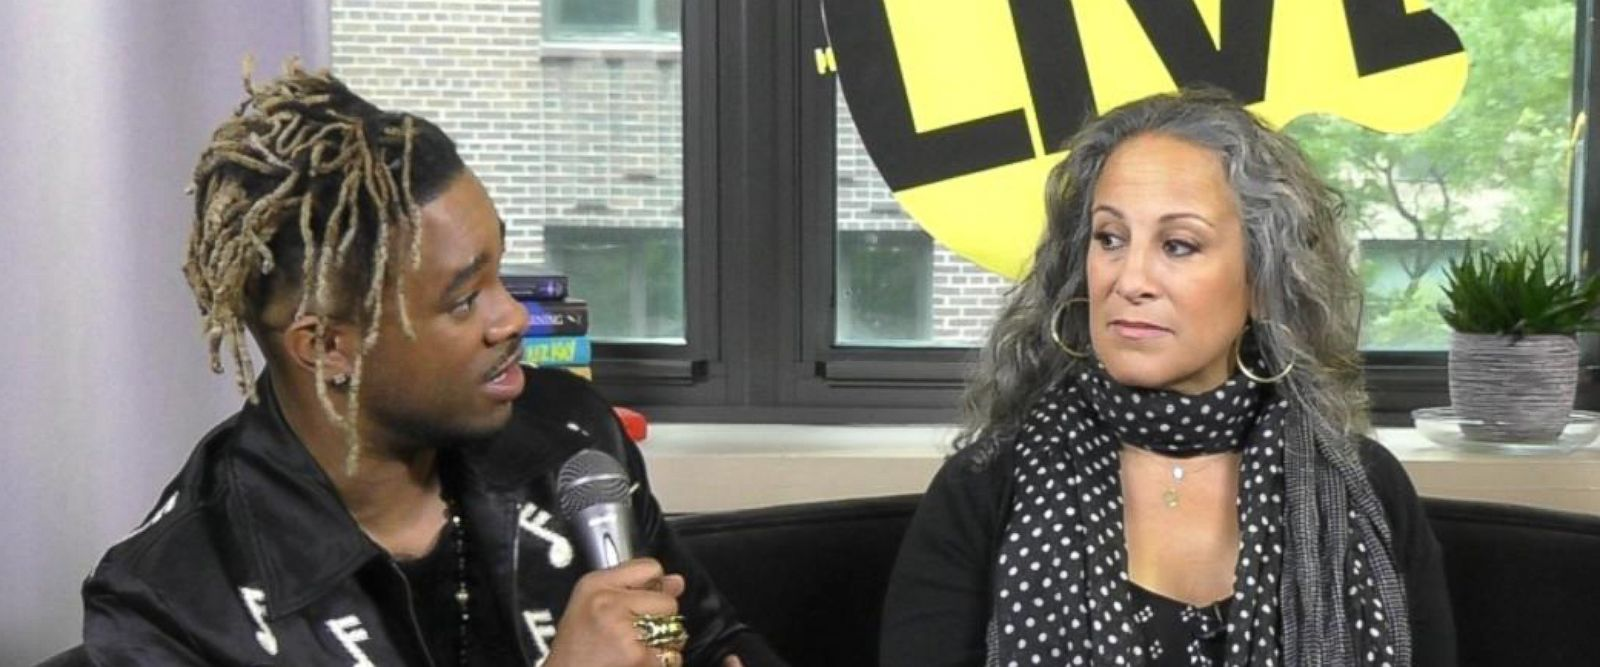 VIDEO: Elijah Blake and Gina Belafonte on activism and music